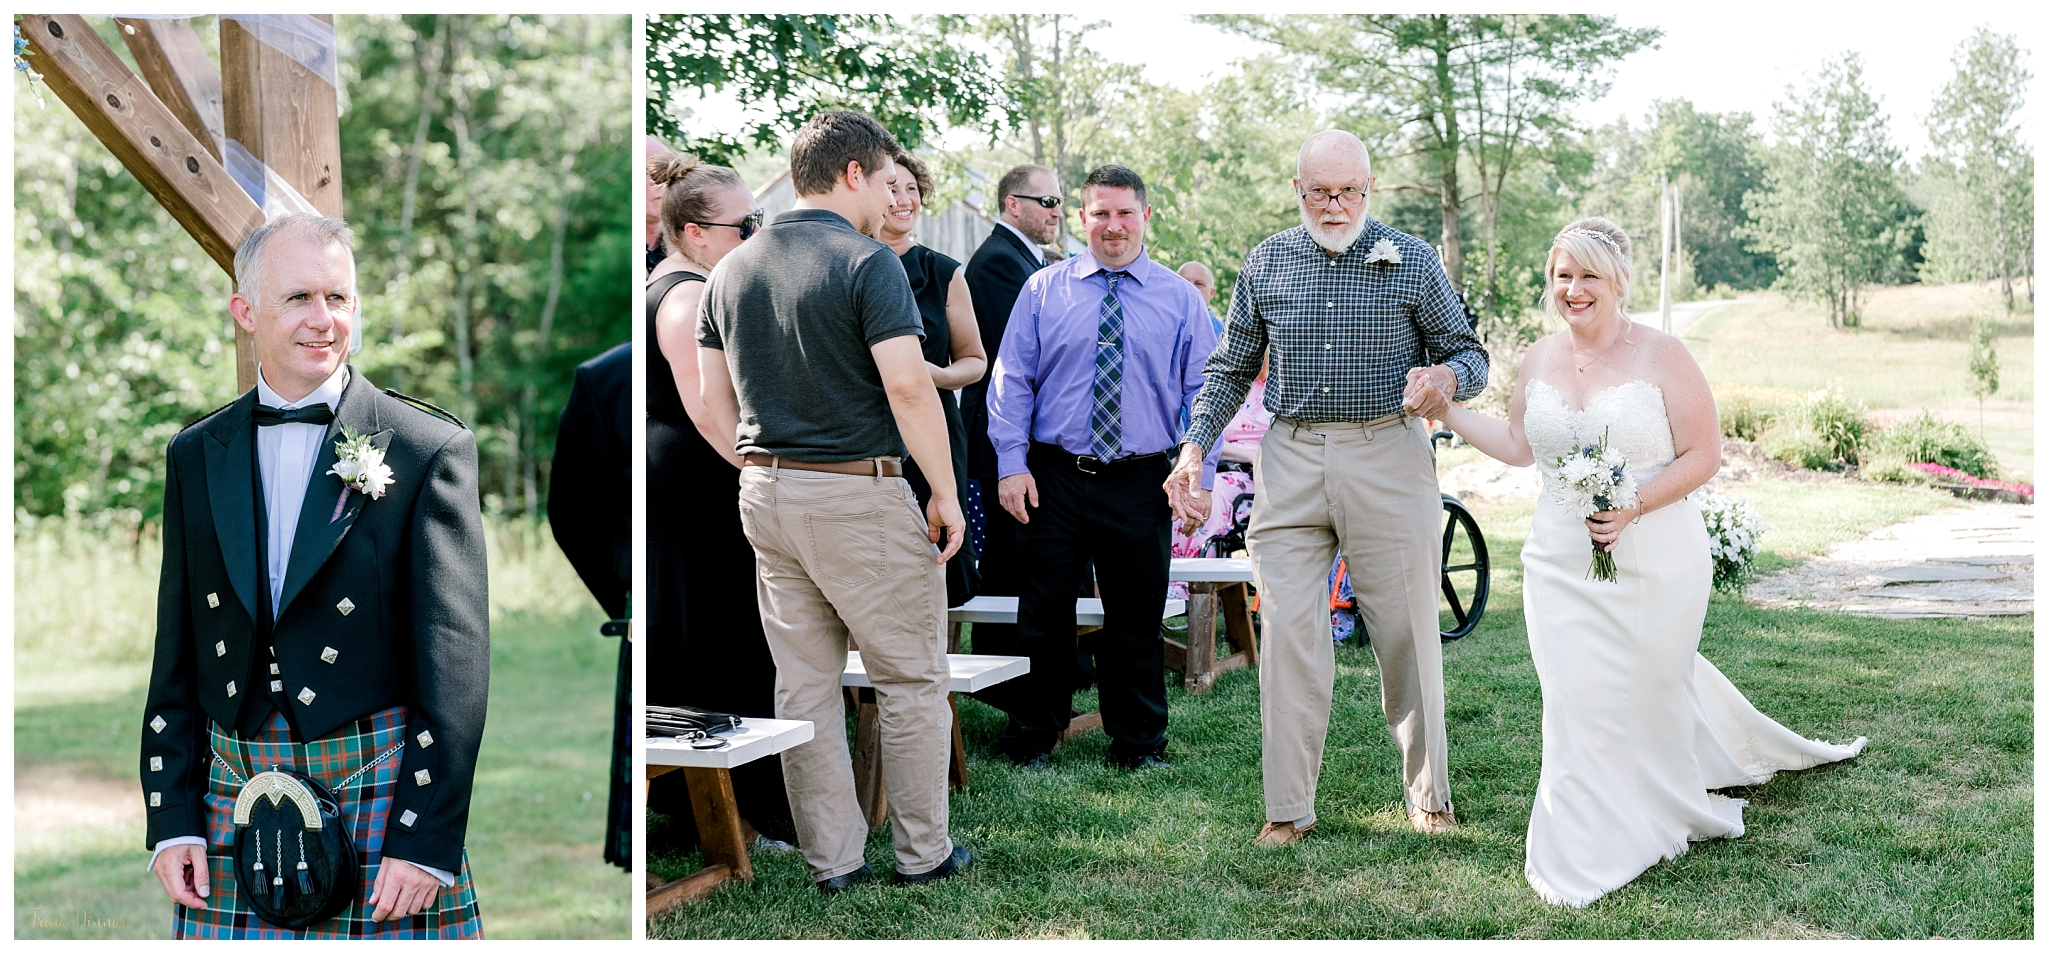 Groom sees Bride at Wedding Ceremony